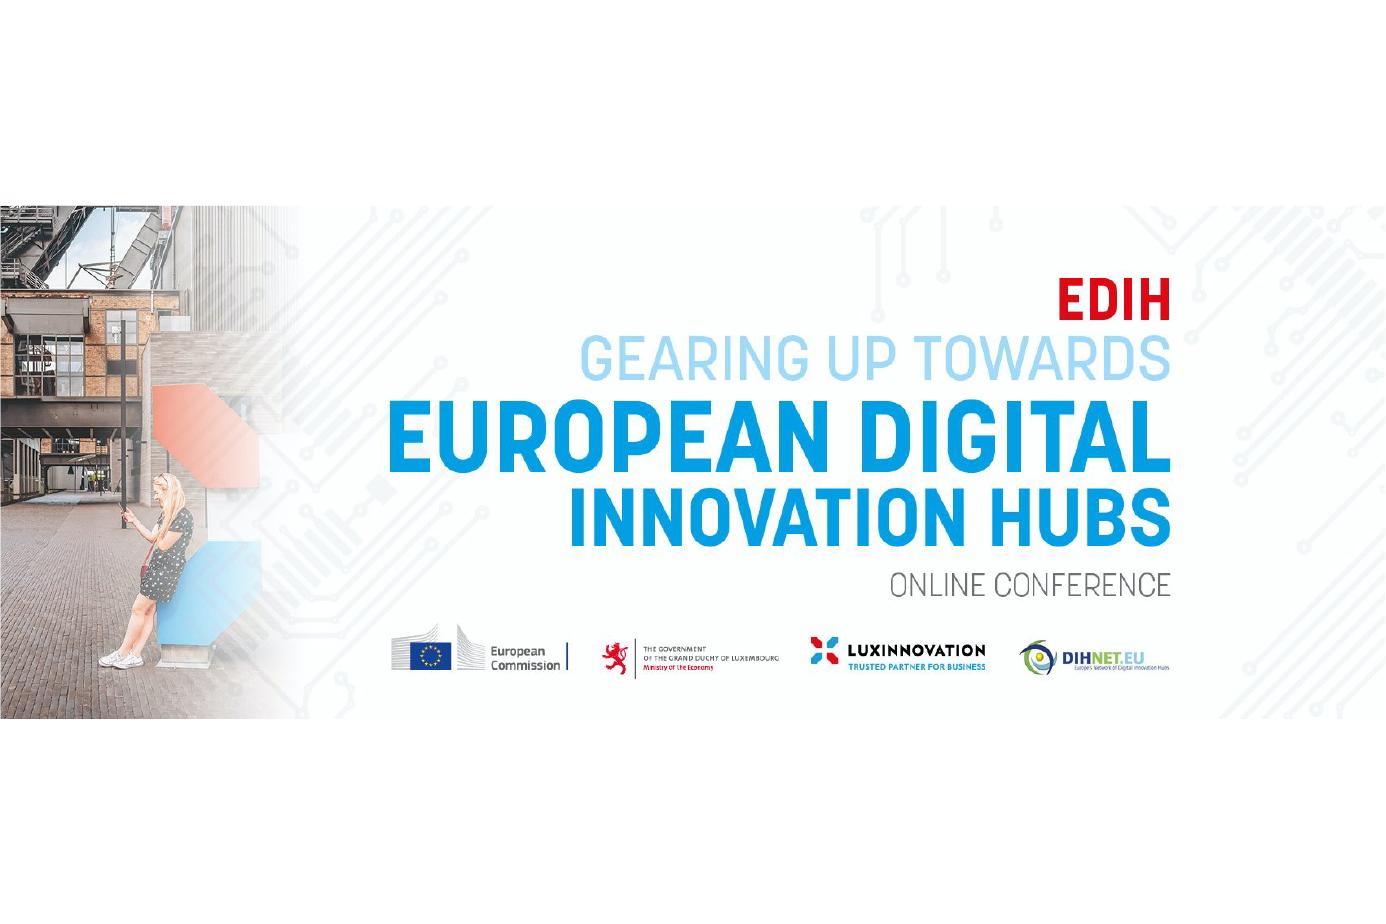 EDIH2021 conference banner